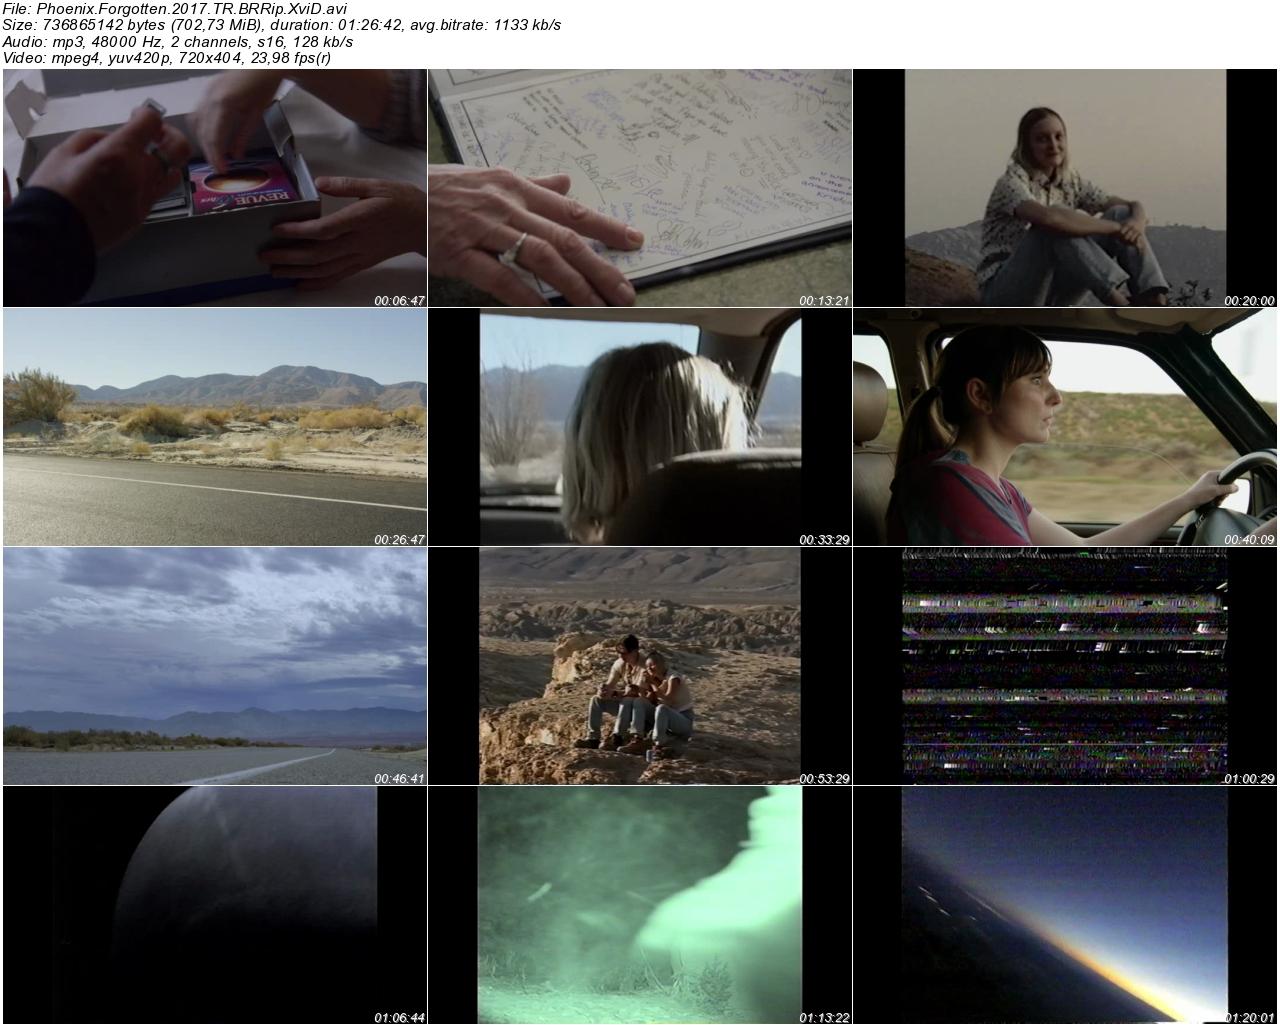 Phoenixte Unutulan 2017 - 1080p 720p 480p - Türkçe Dublaj Tek Link indir